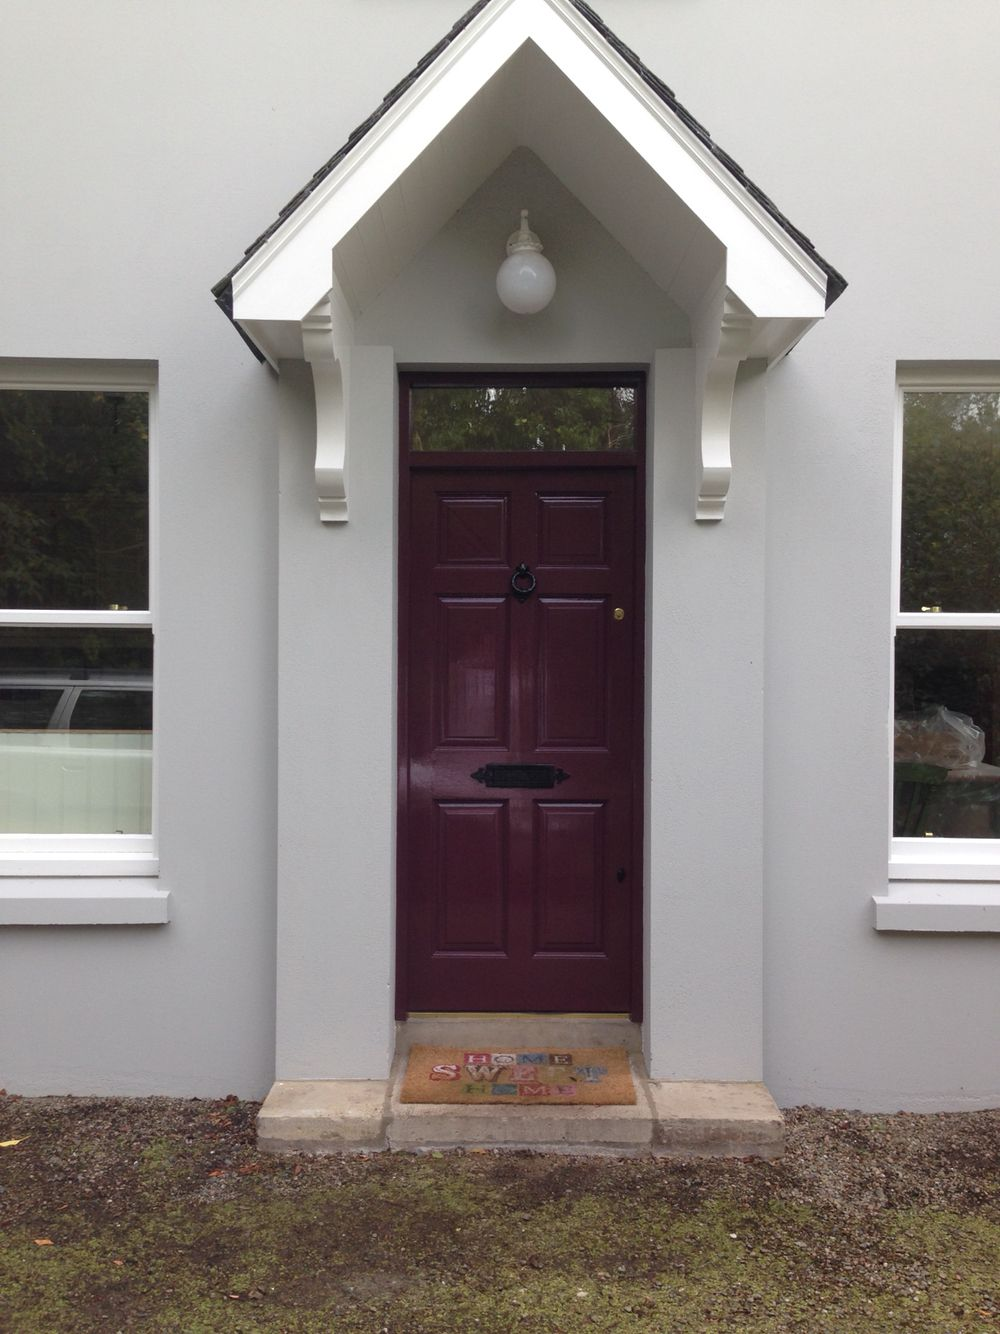 farrow ball pavilion grey with brinjal front door - Farrow And Ball Brinjal